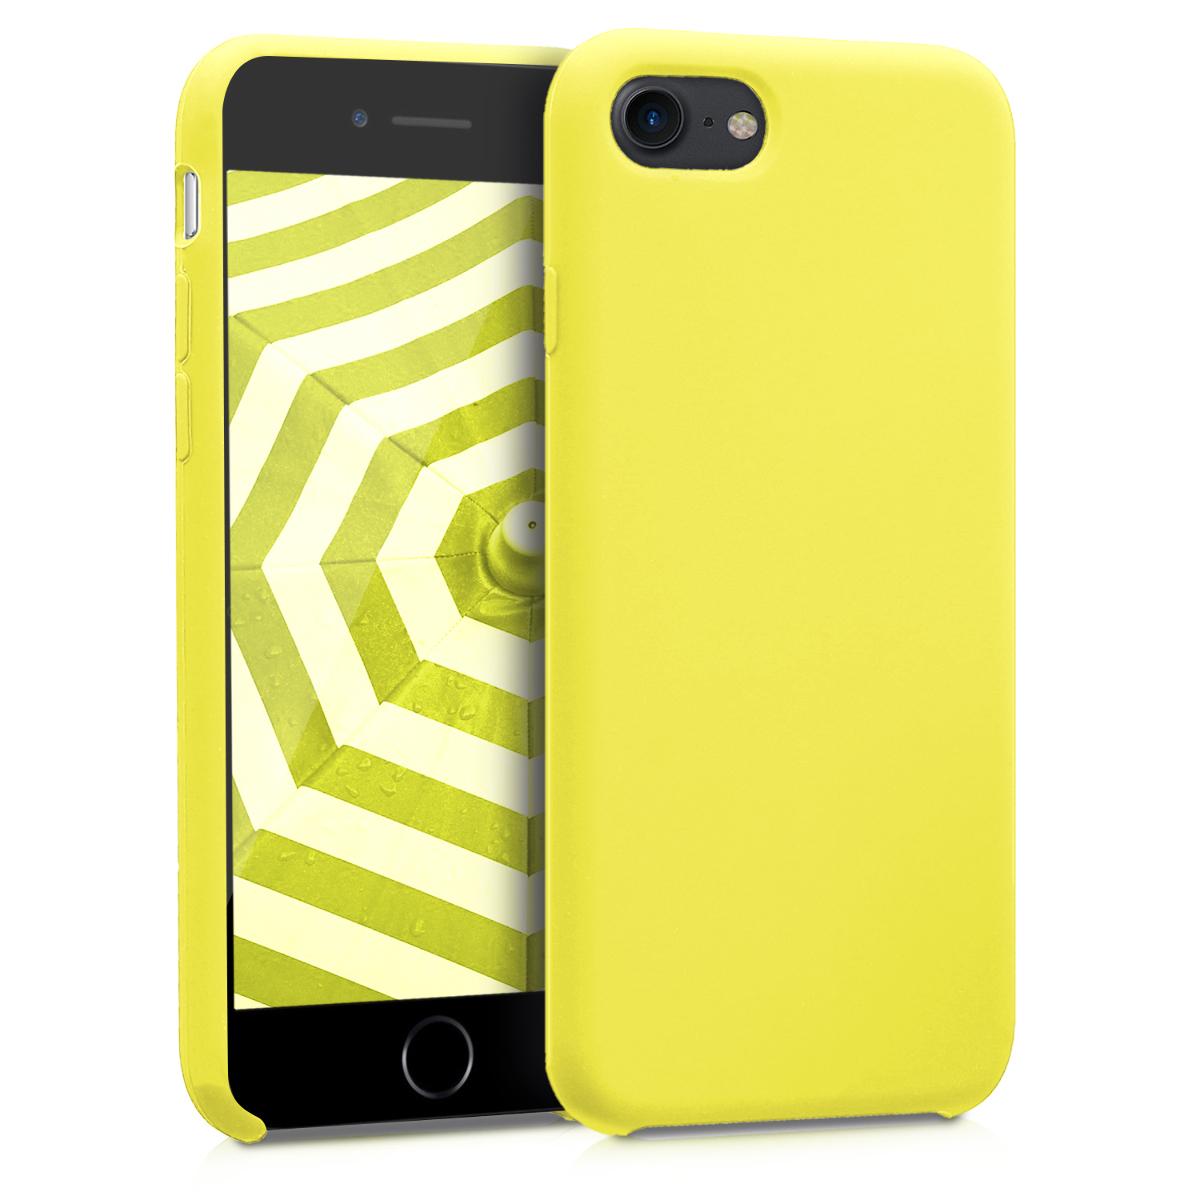 KW Soft Flexible Rubber Θήκη Σιλικόνης iPhone 7 / 8 - Neon Κίτρινο (40225.75)